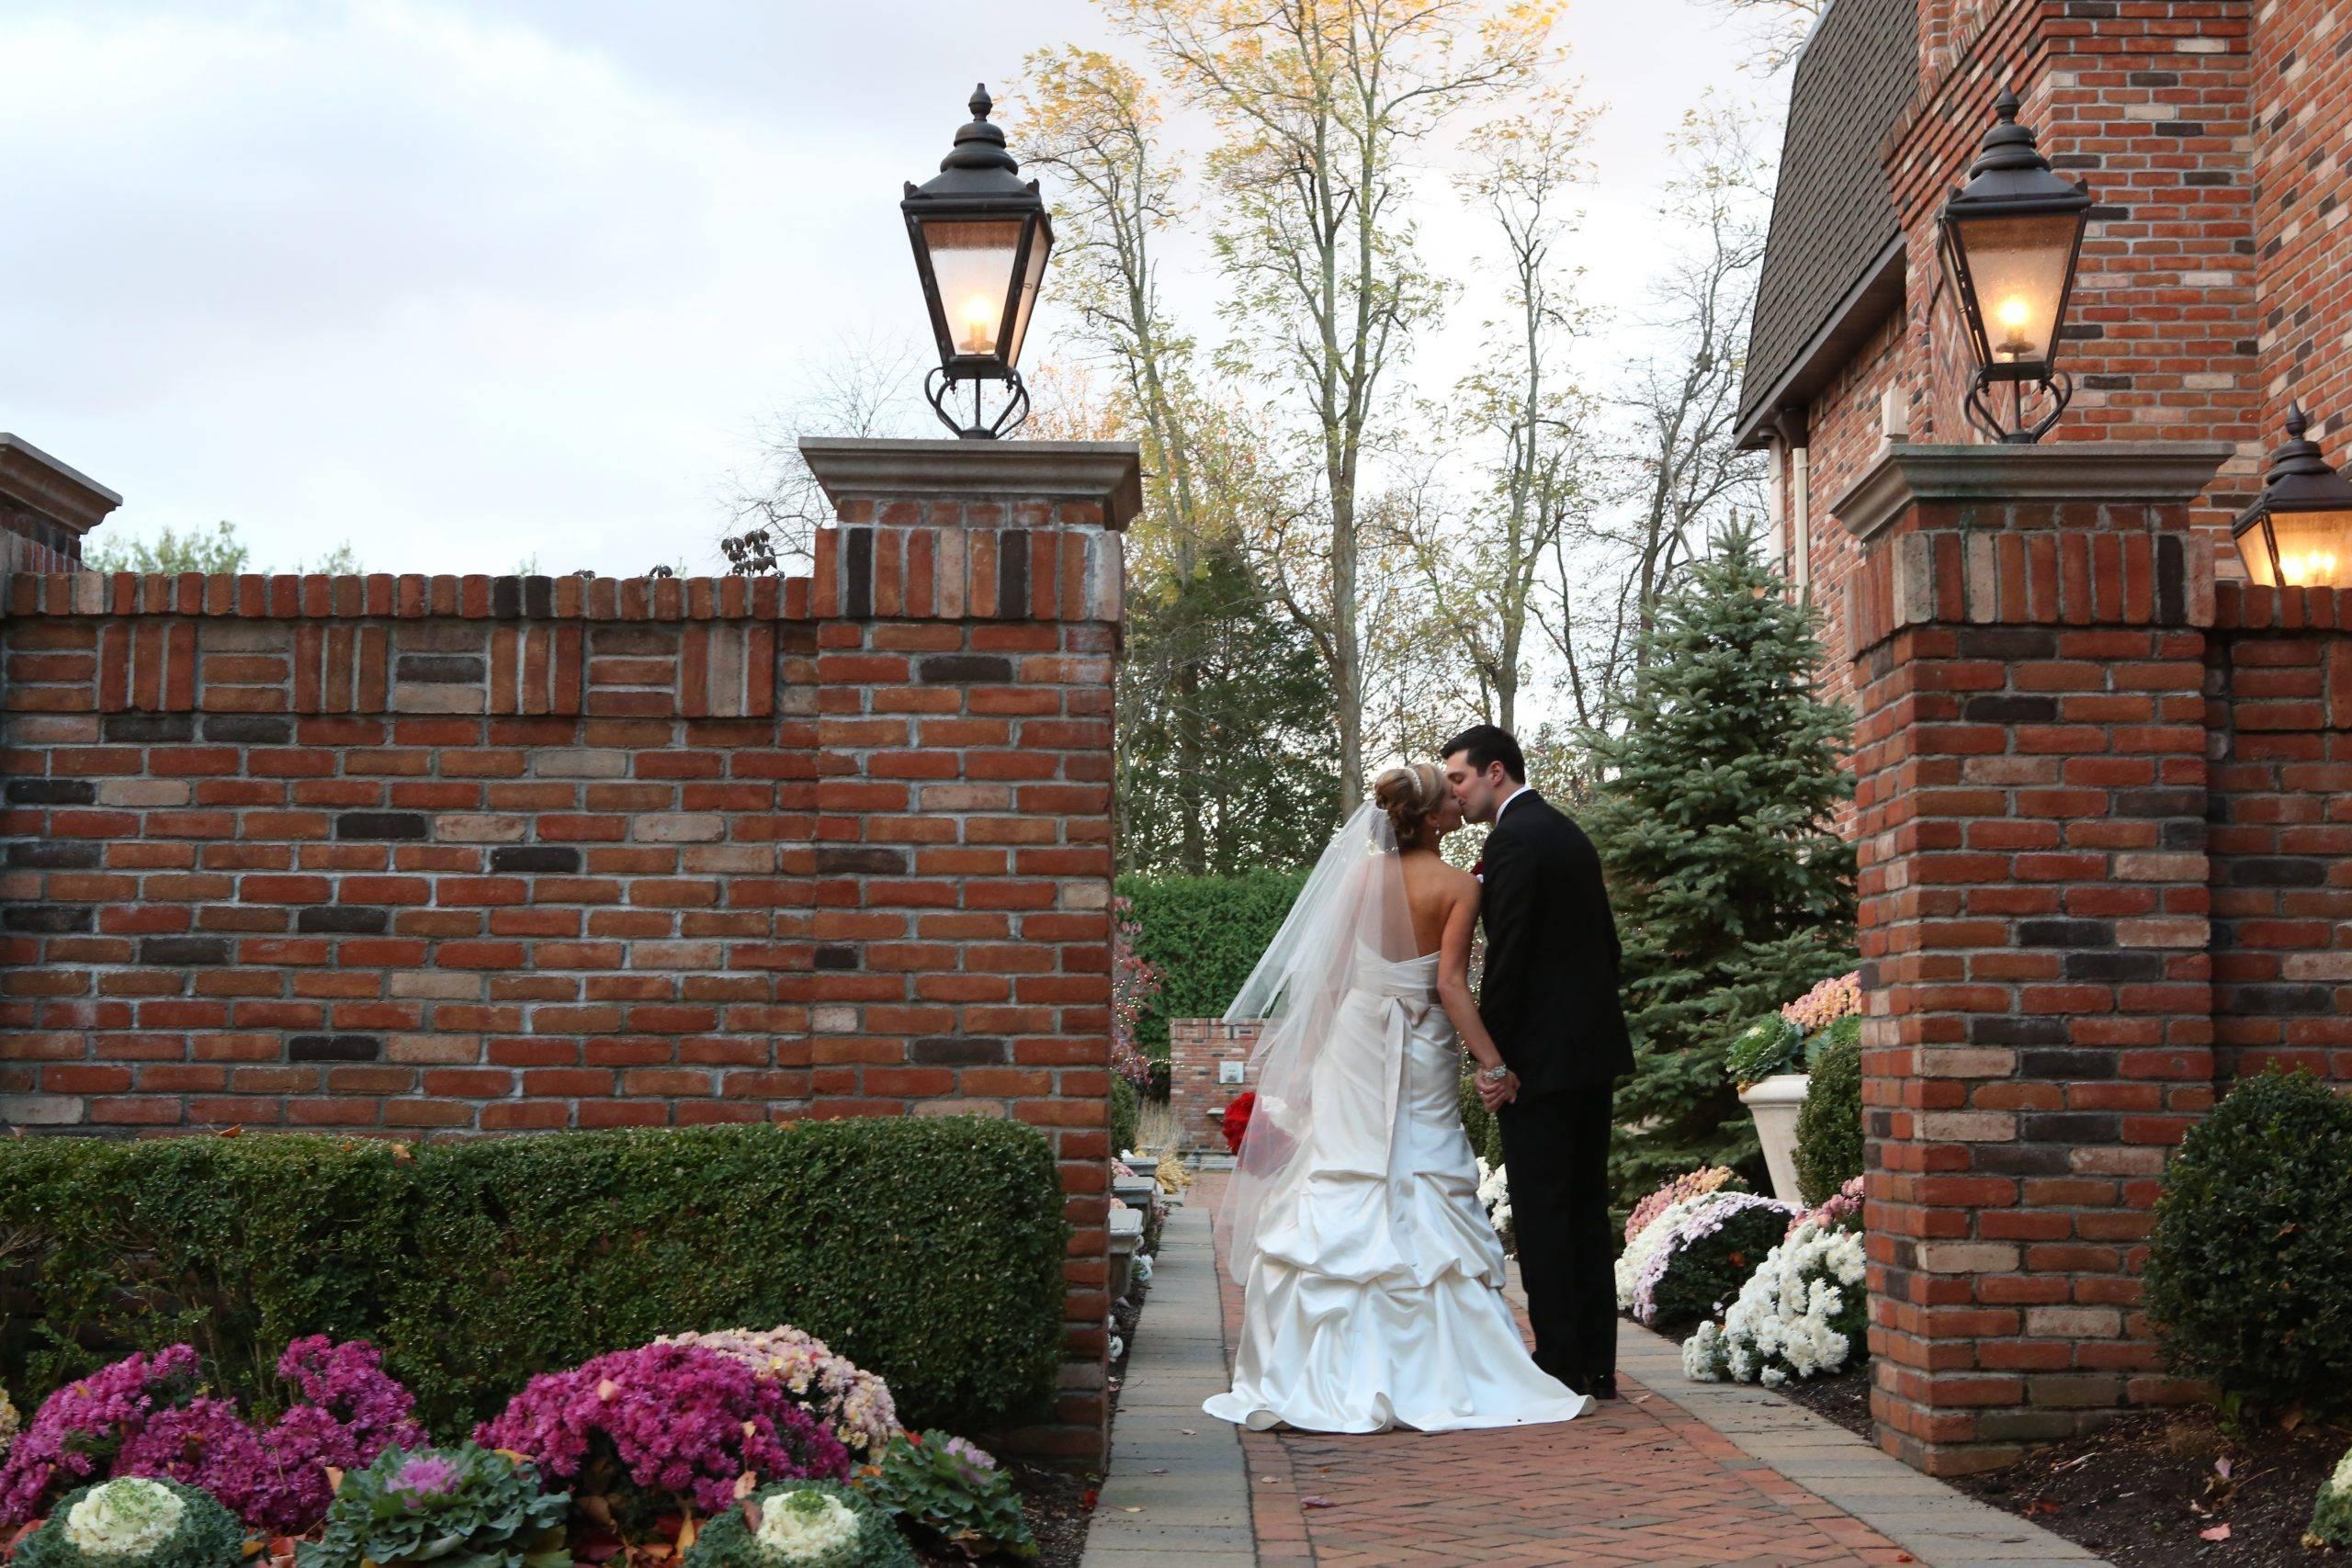 Florentine Gardens bride and groom kissing